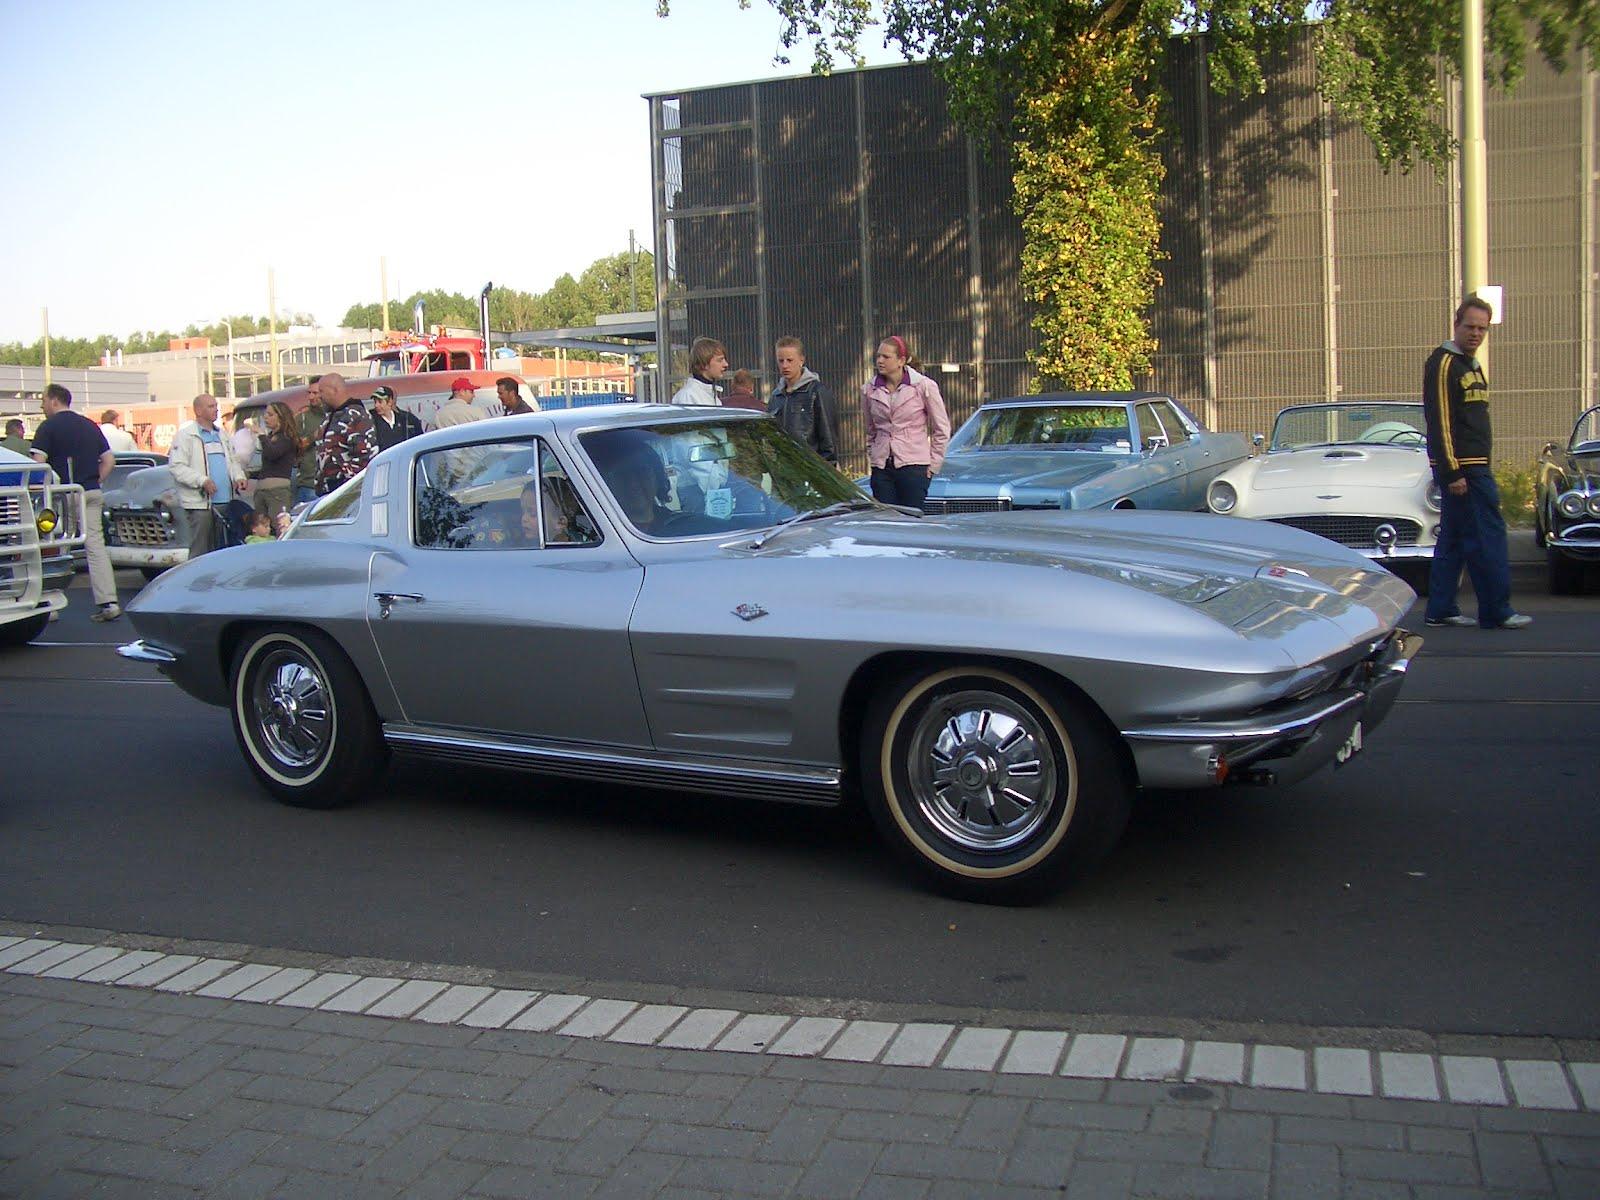 legendary cars chevrolet corvette c2 stingray 1963 1967. Black Bedroom Furniture Sets. Home Design Ideas